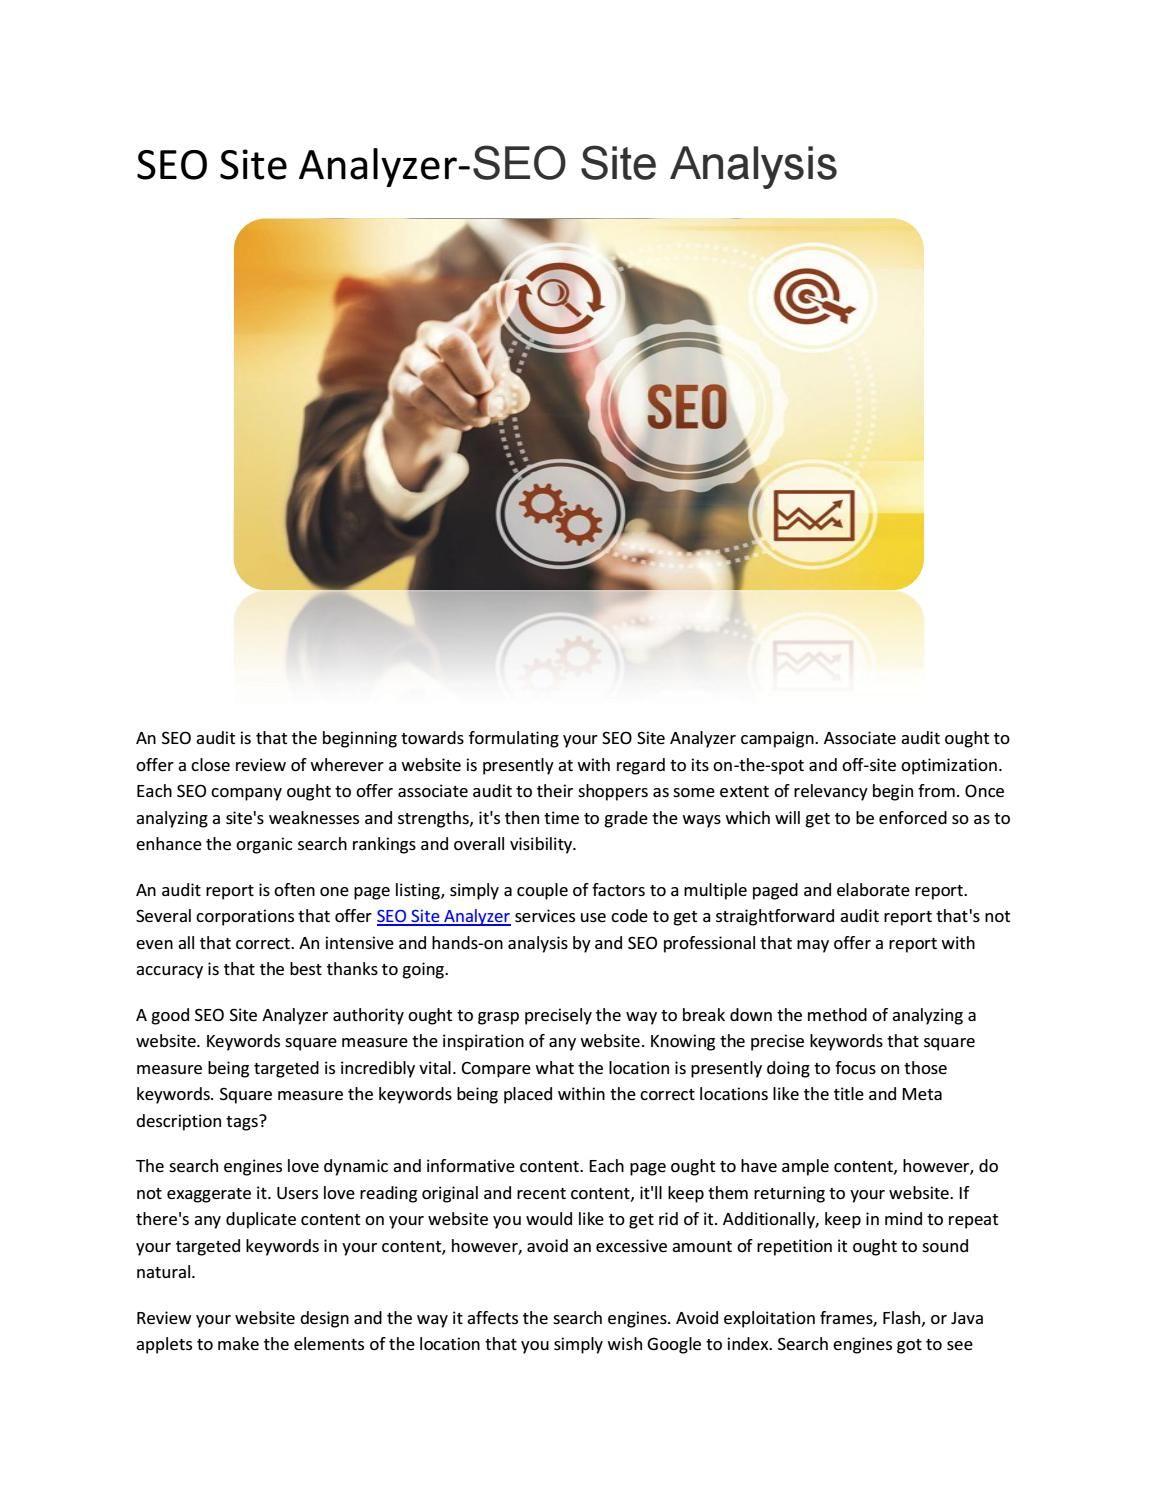 Seo Site AnalyzerSeo Site Analysis  Site Analyzer Seo Site And Seo